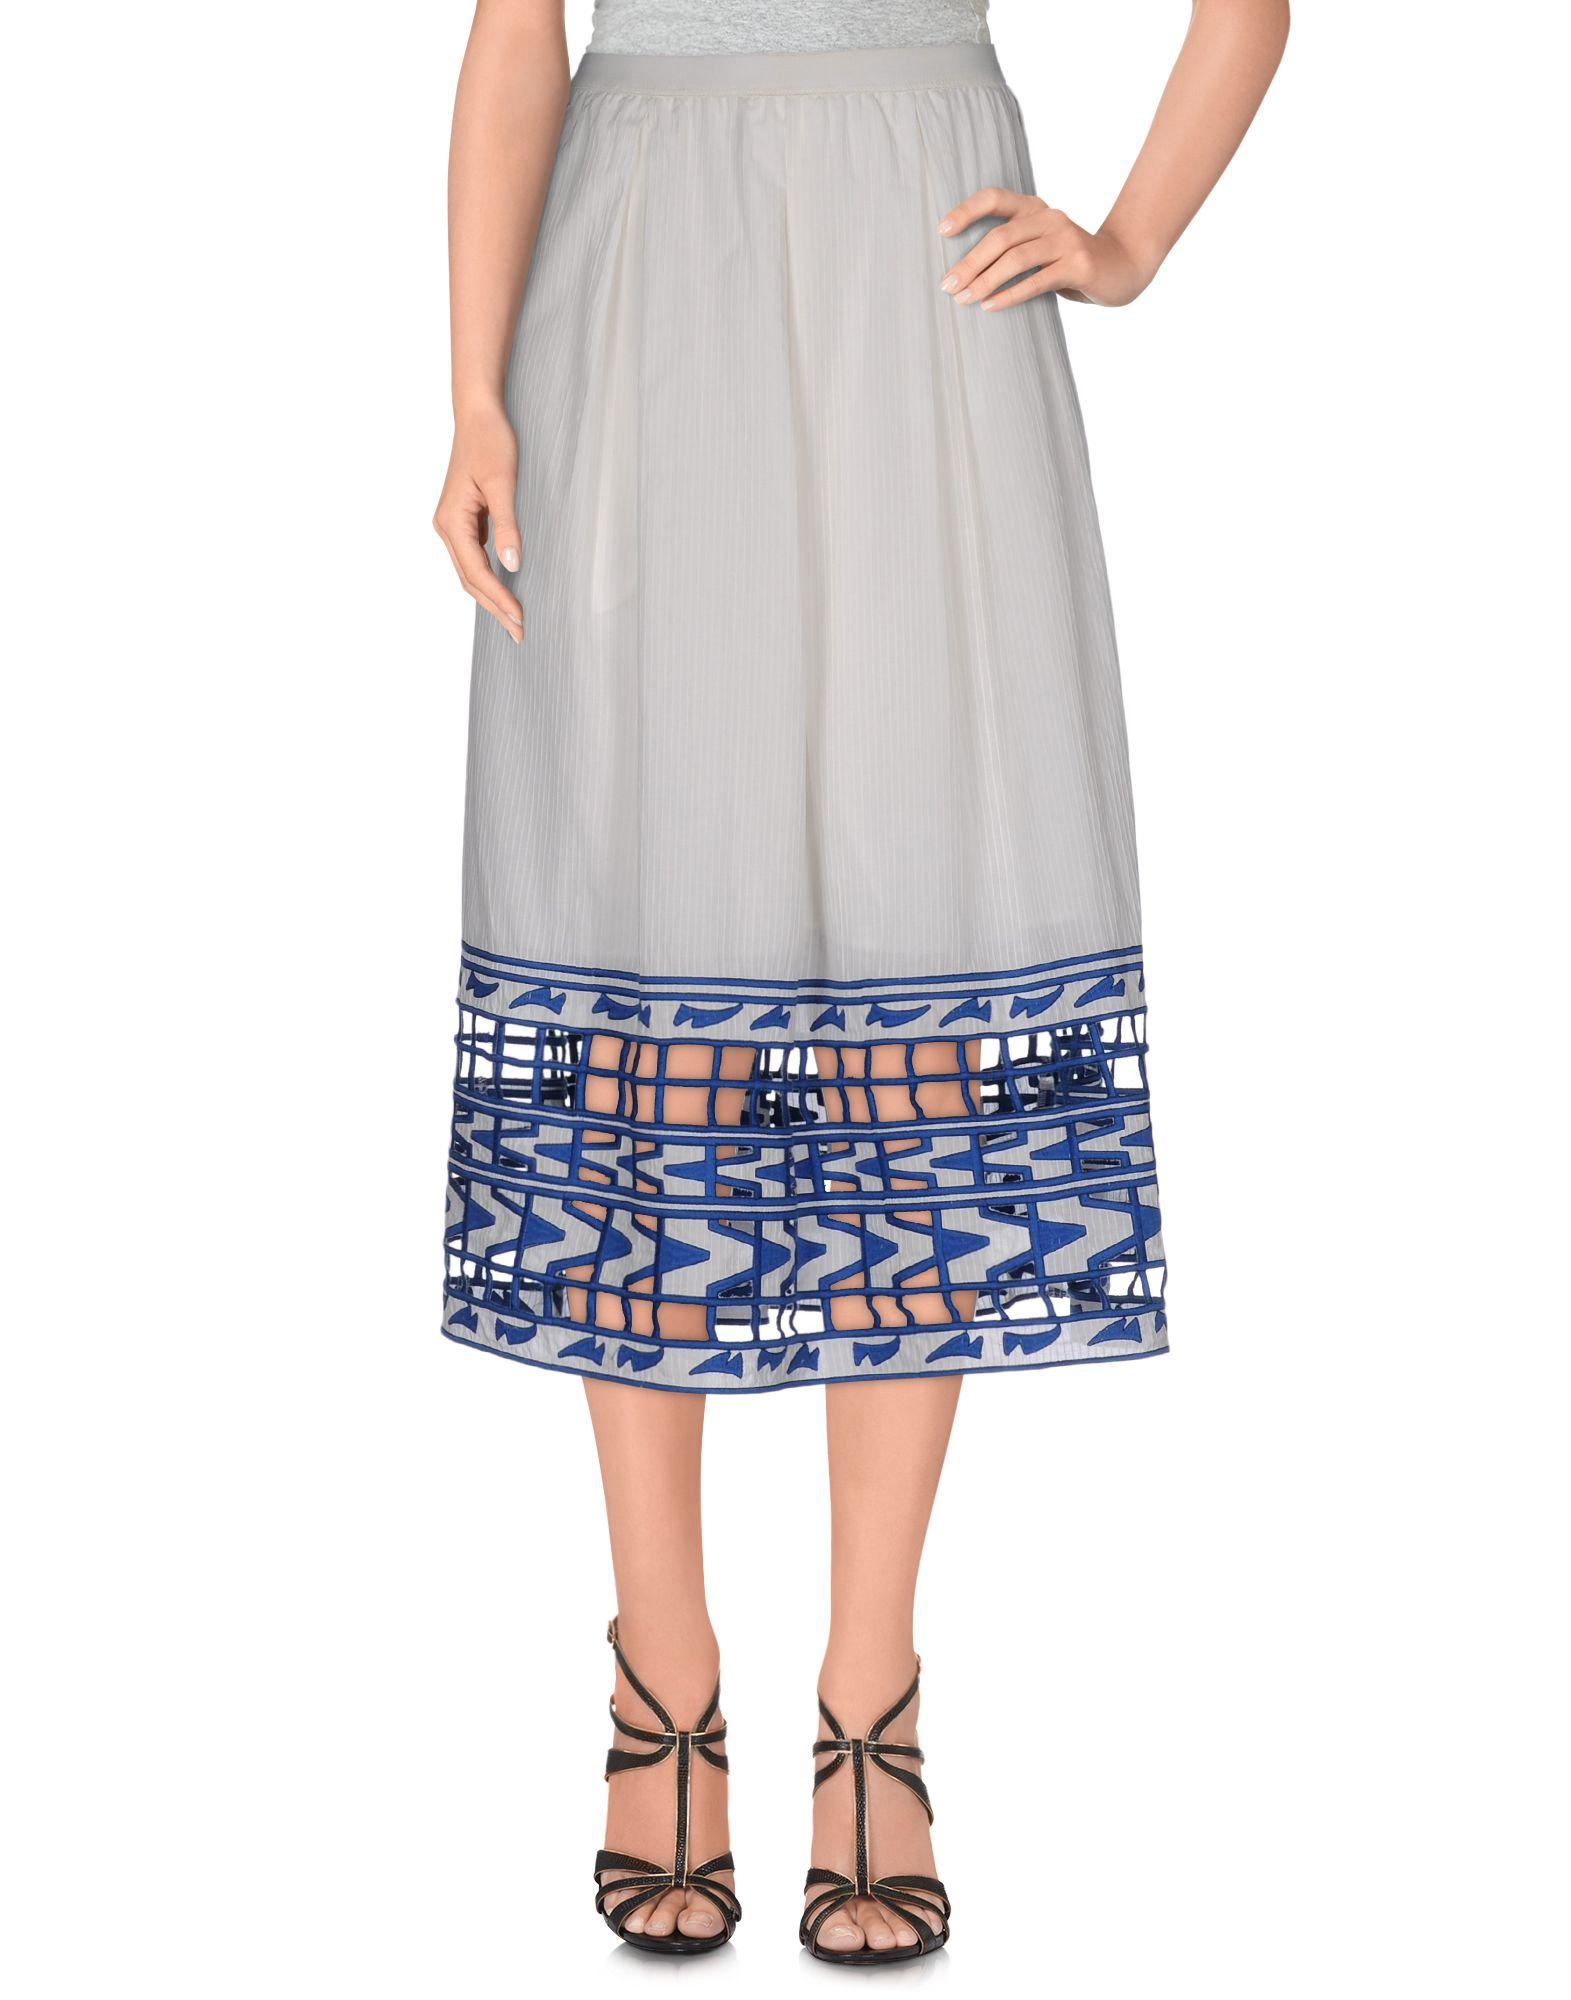 SEA Юбка длиной 3/4 moschino couture юбка длиной 3 4